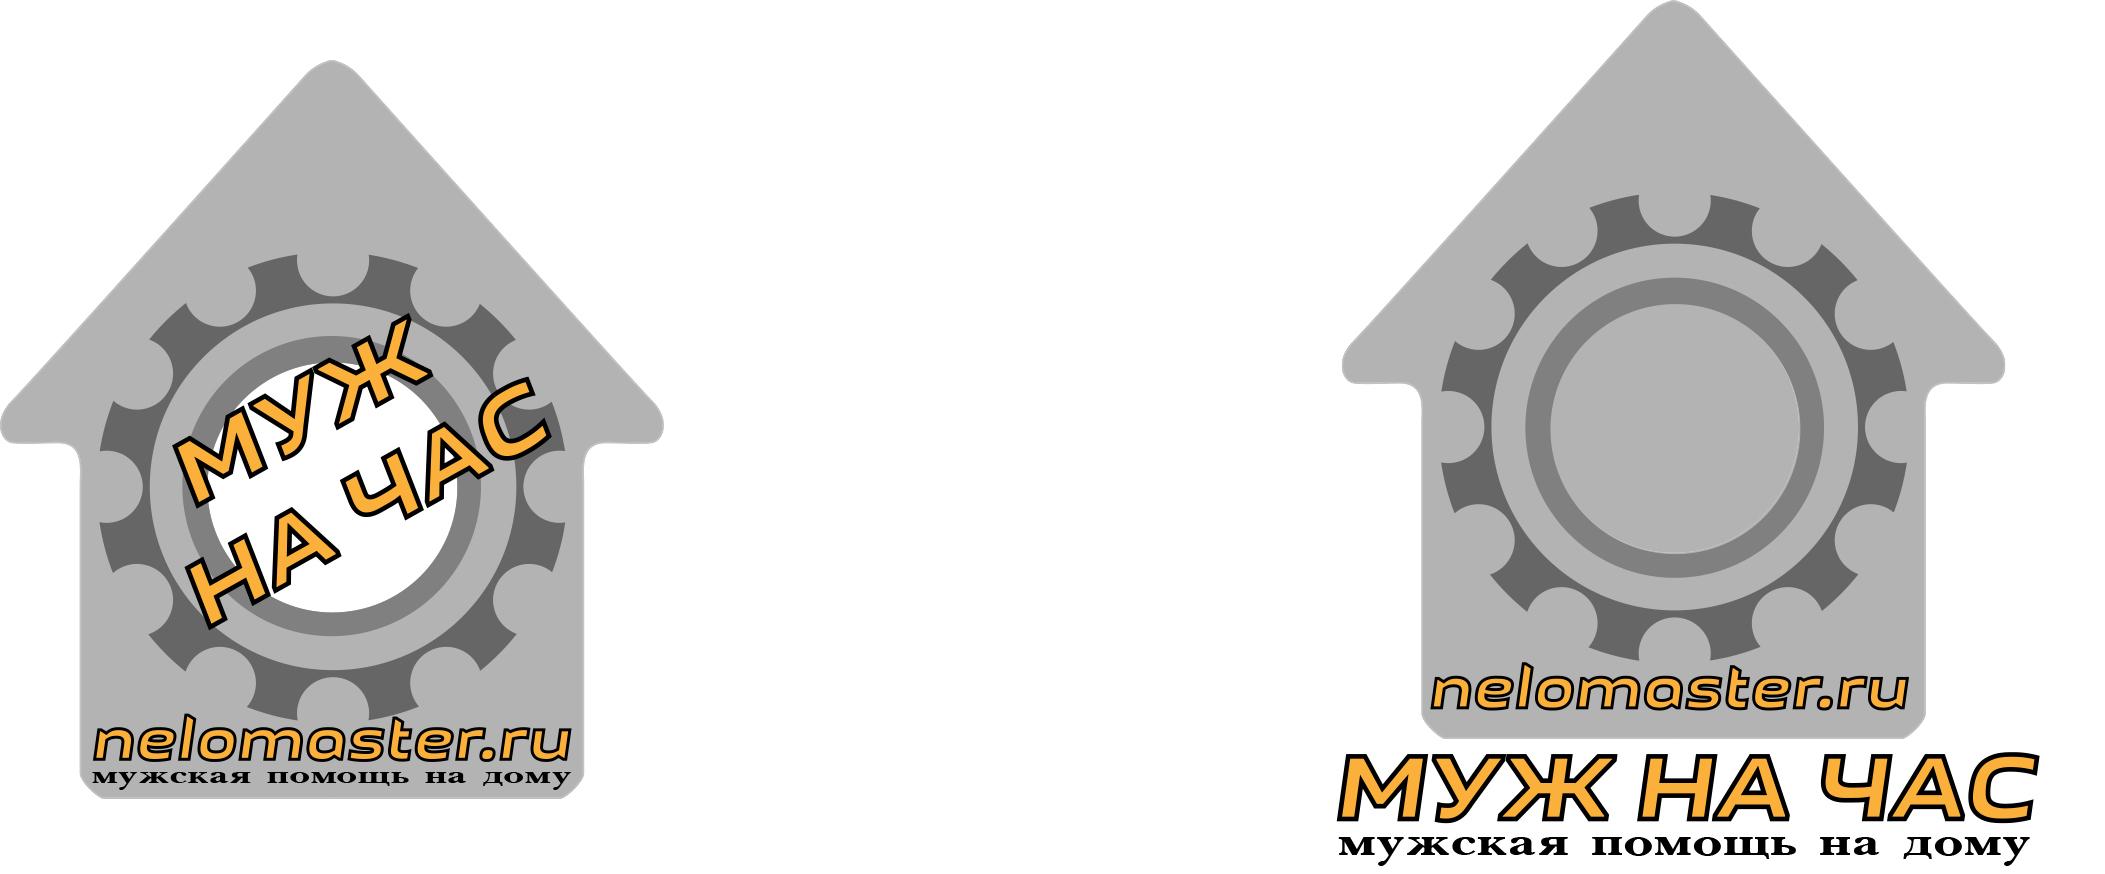 "Логотип сервиса ""Муж на час""=""Мужская помощь по дому"" фото f_9085dbbdb4830403.jpg"